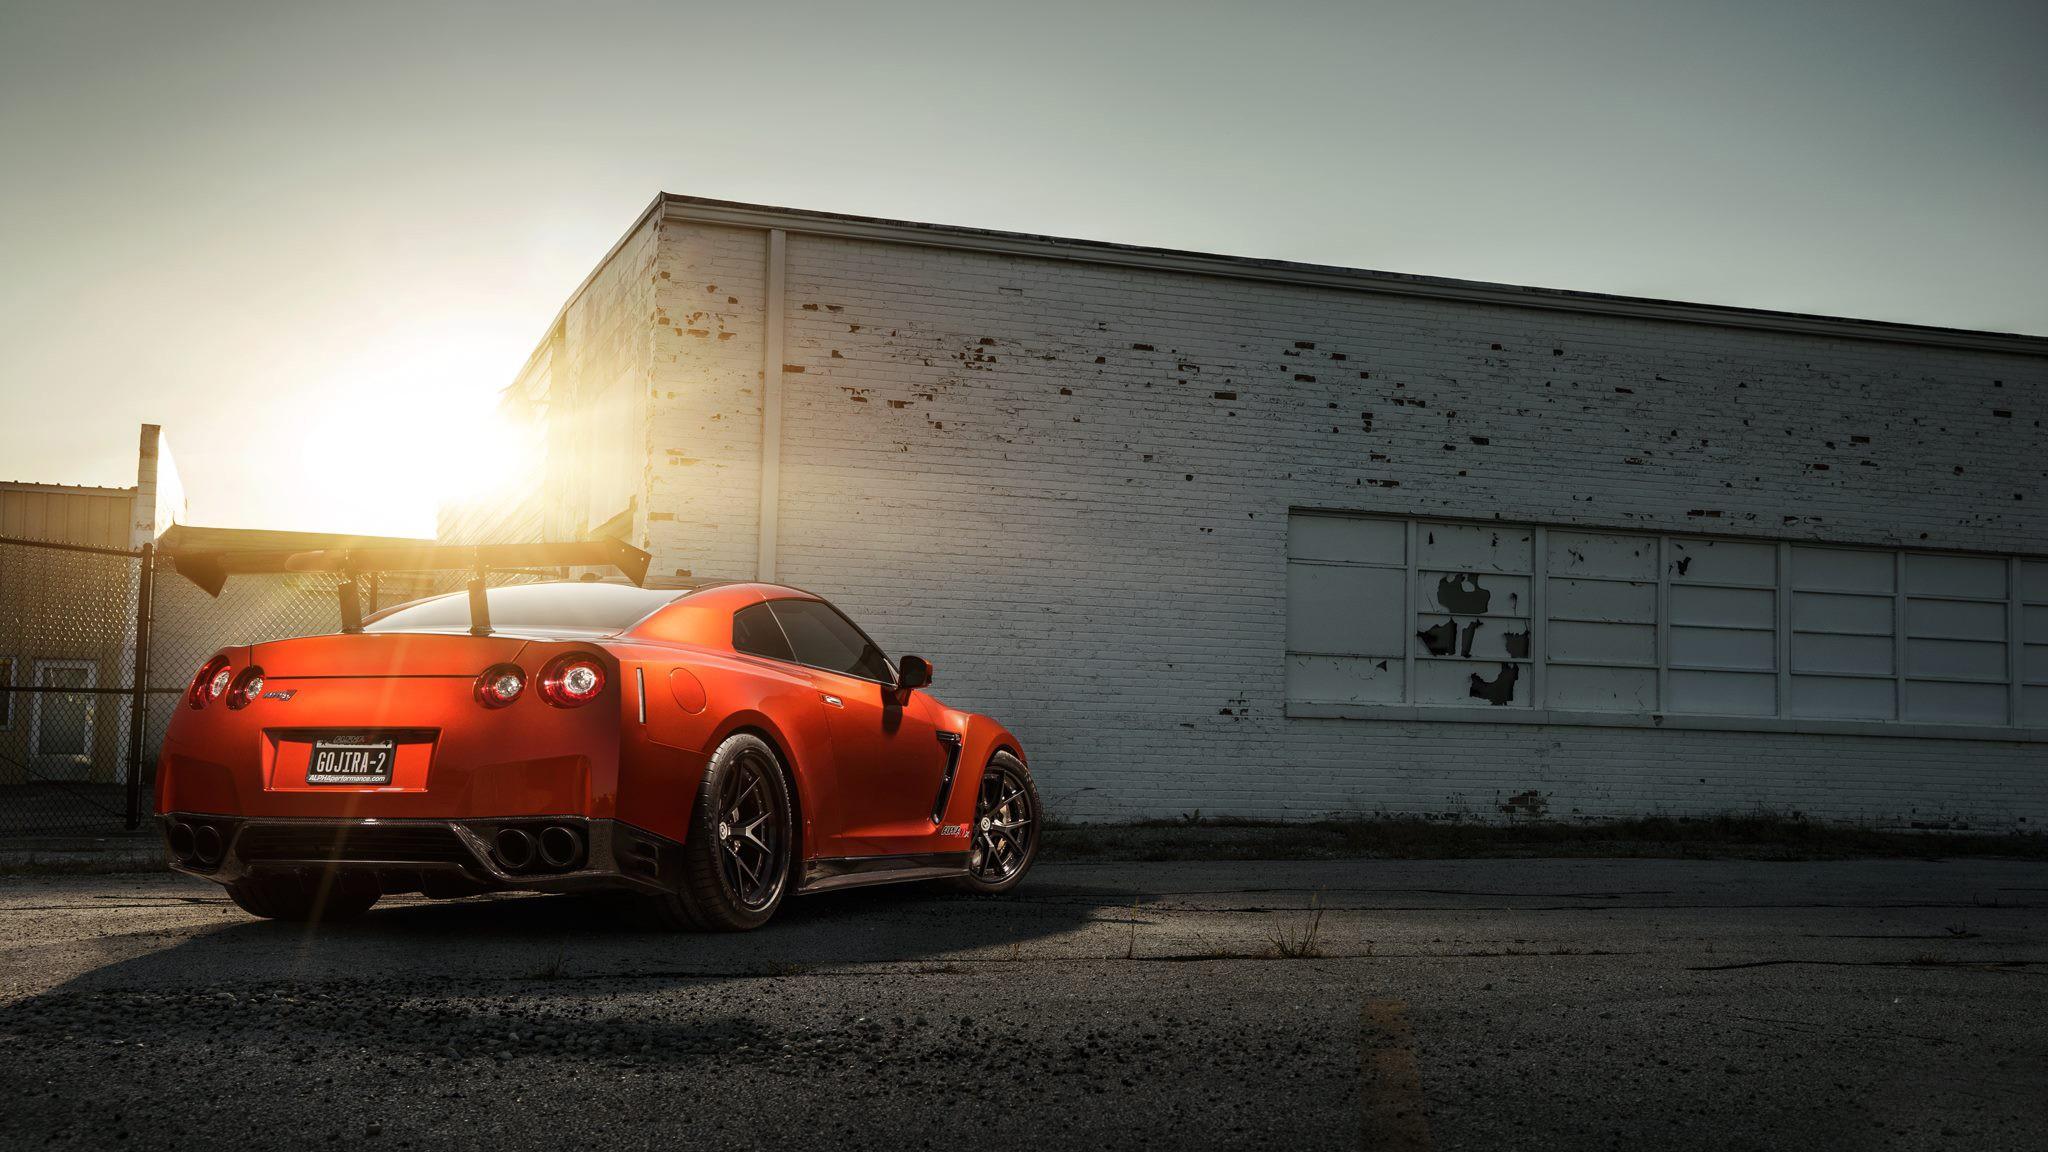 car vehicle Nissan Nissan GTR red cars sports car Nissan GT R coupe wheel supercar 2048x1152